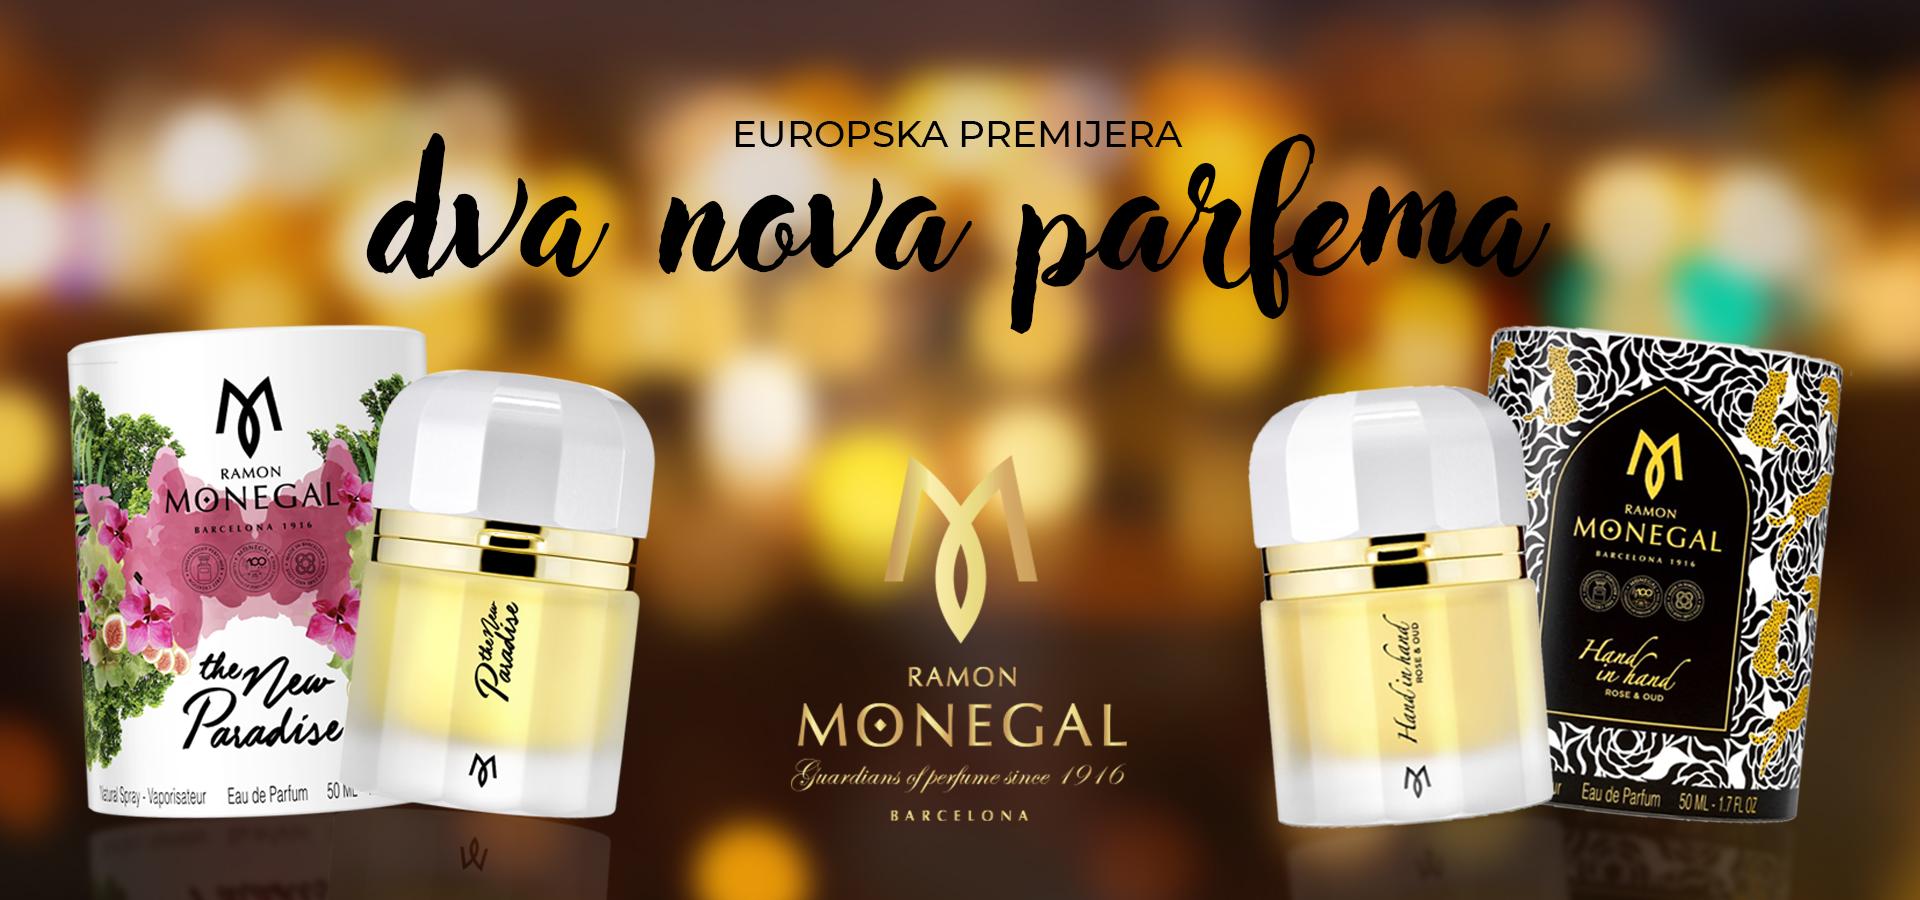 Prvi u Europi lansiramo dva noviteta Ramona Monegala